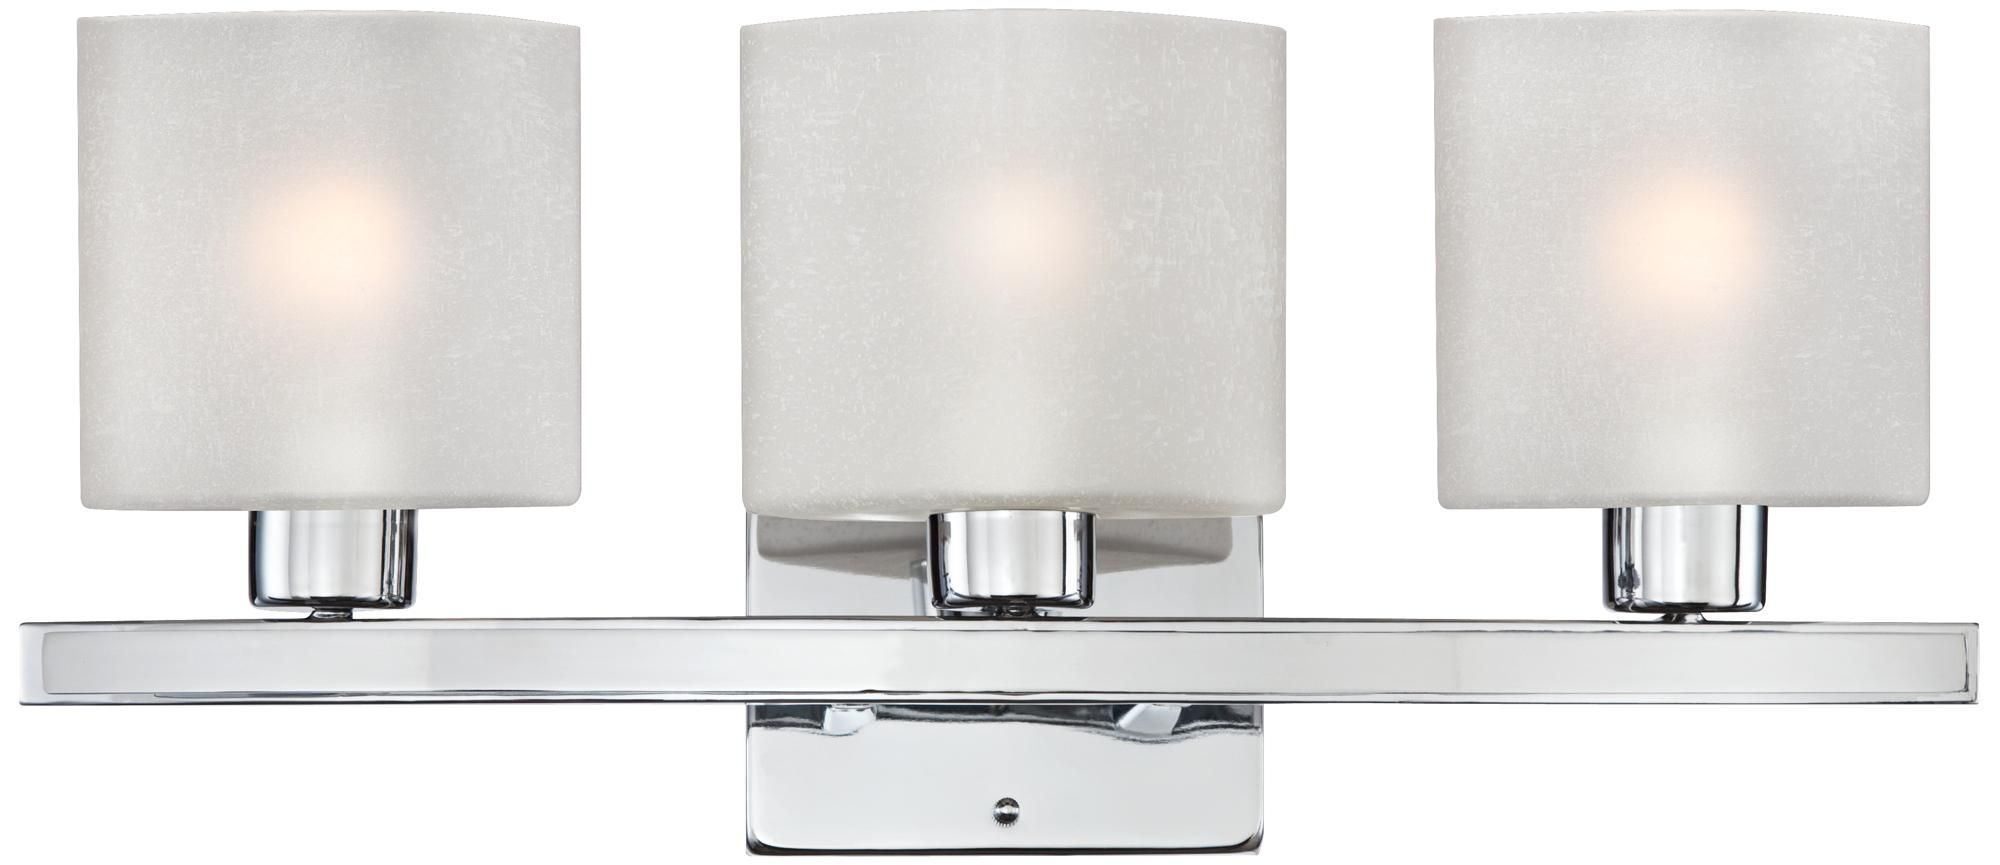 Possini Euro Linen Glass 23 1 2 Wide Chrome Bath Light U1332 Lamps Plus Bath Light White Light Fixture Wall Lights